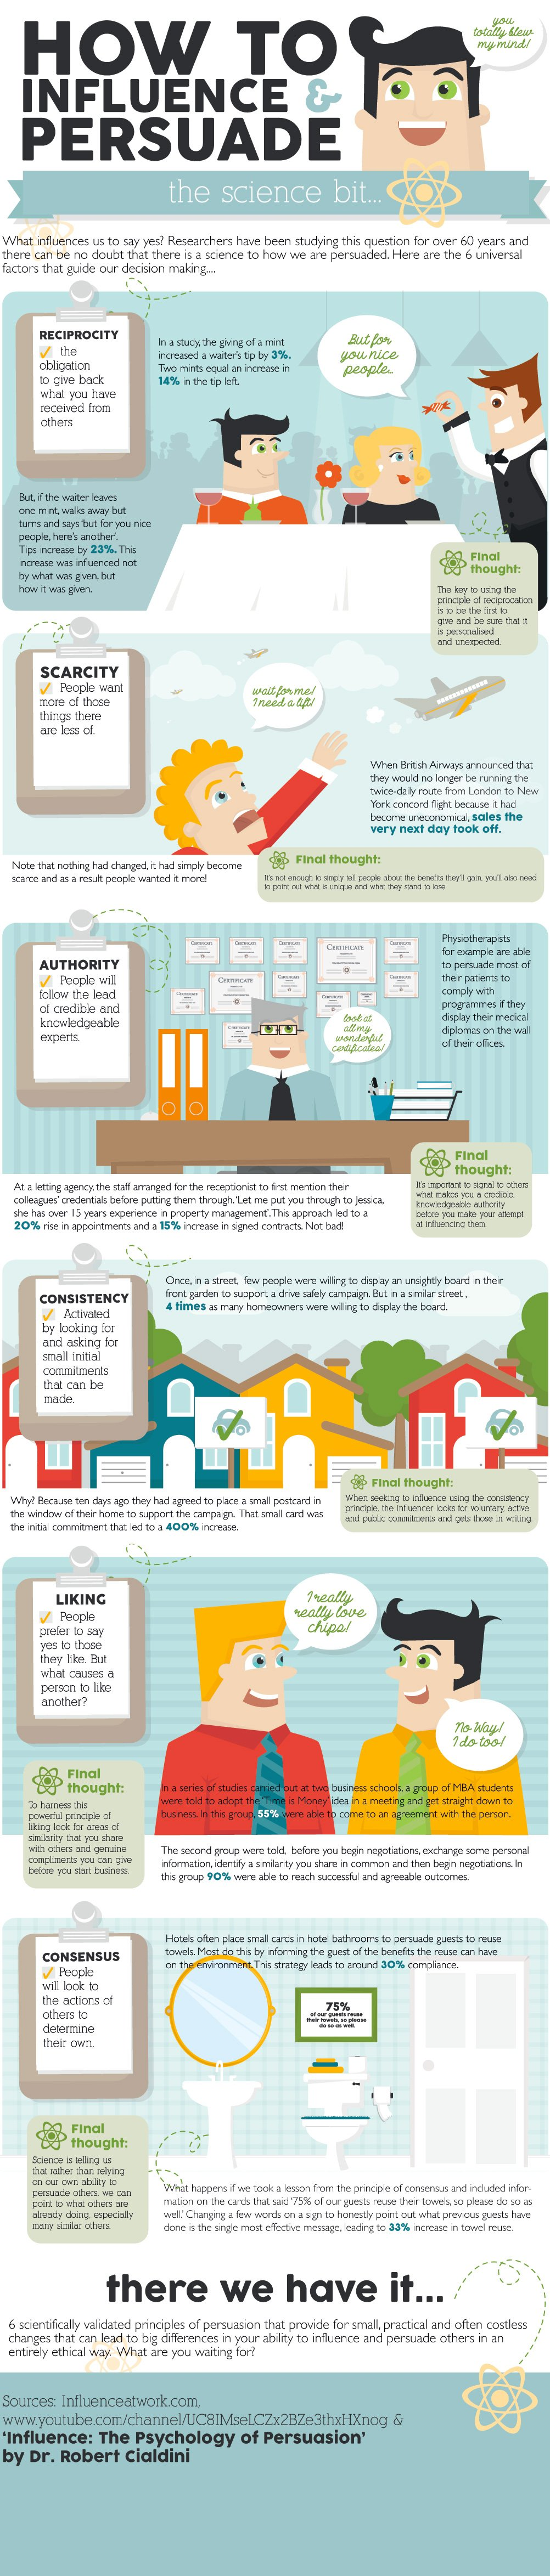 6-elements-persuasion-infographic